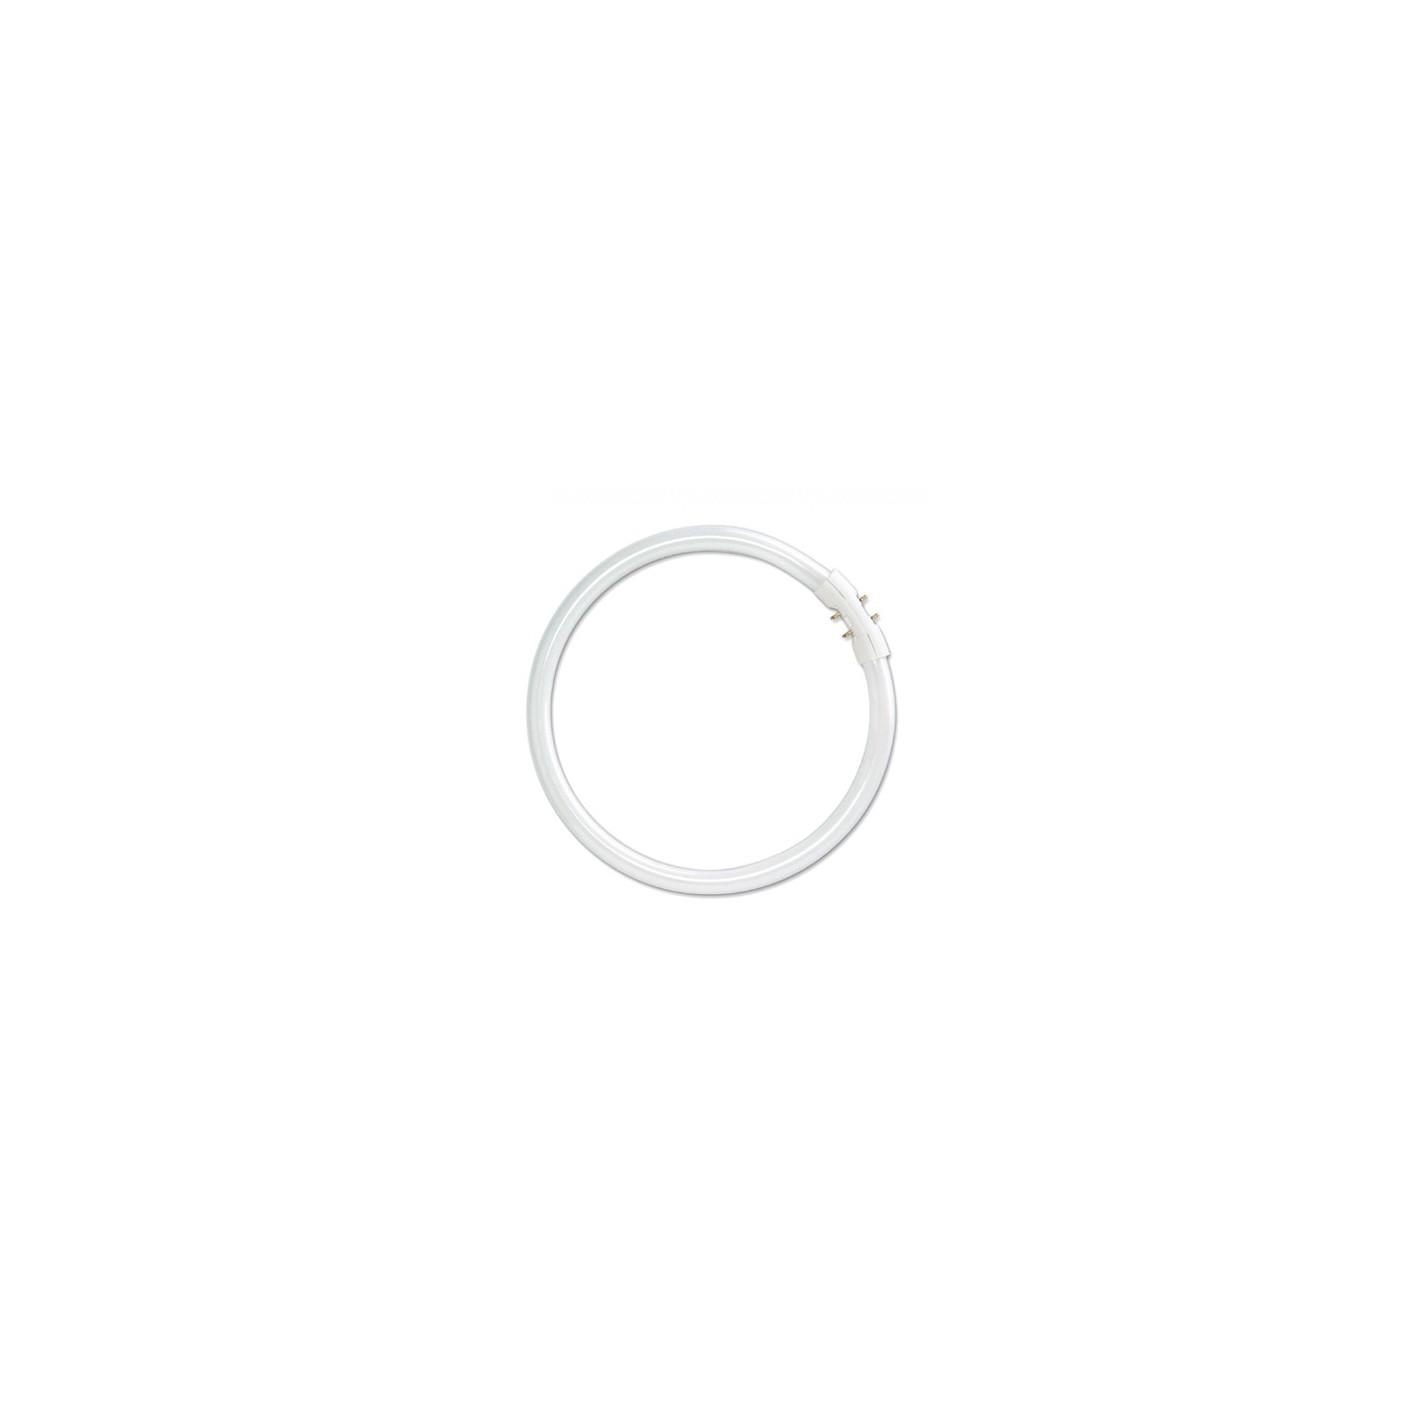 Tubo circular t5 de 22w de potencia luxram algsistemas - Tubo fluorescente circular ...